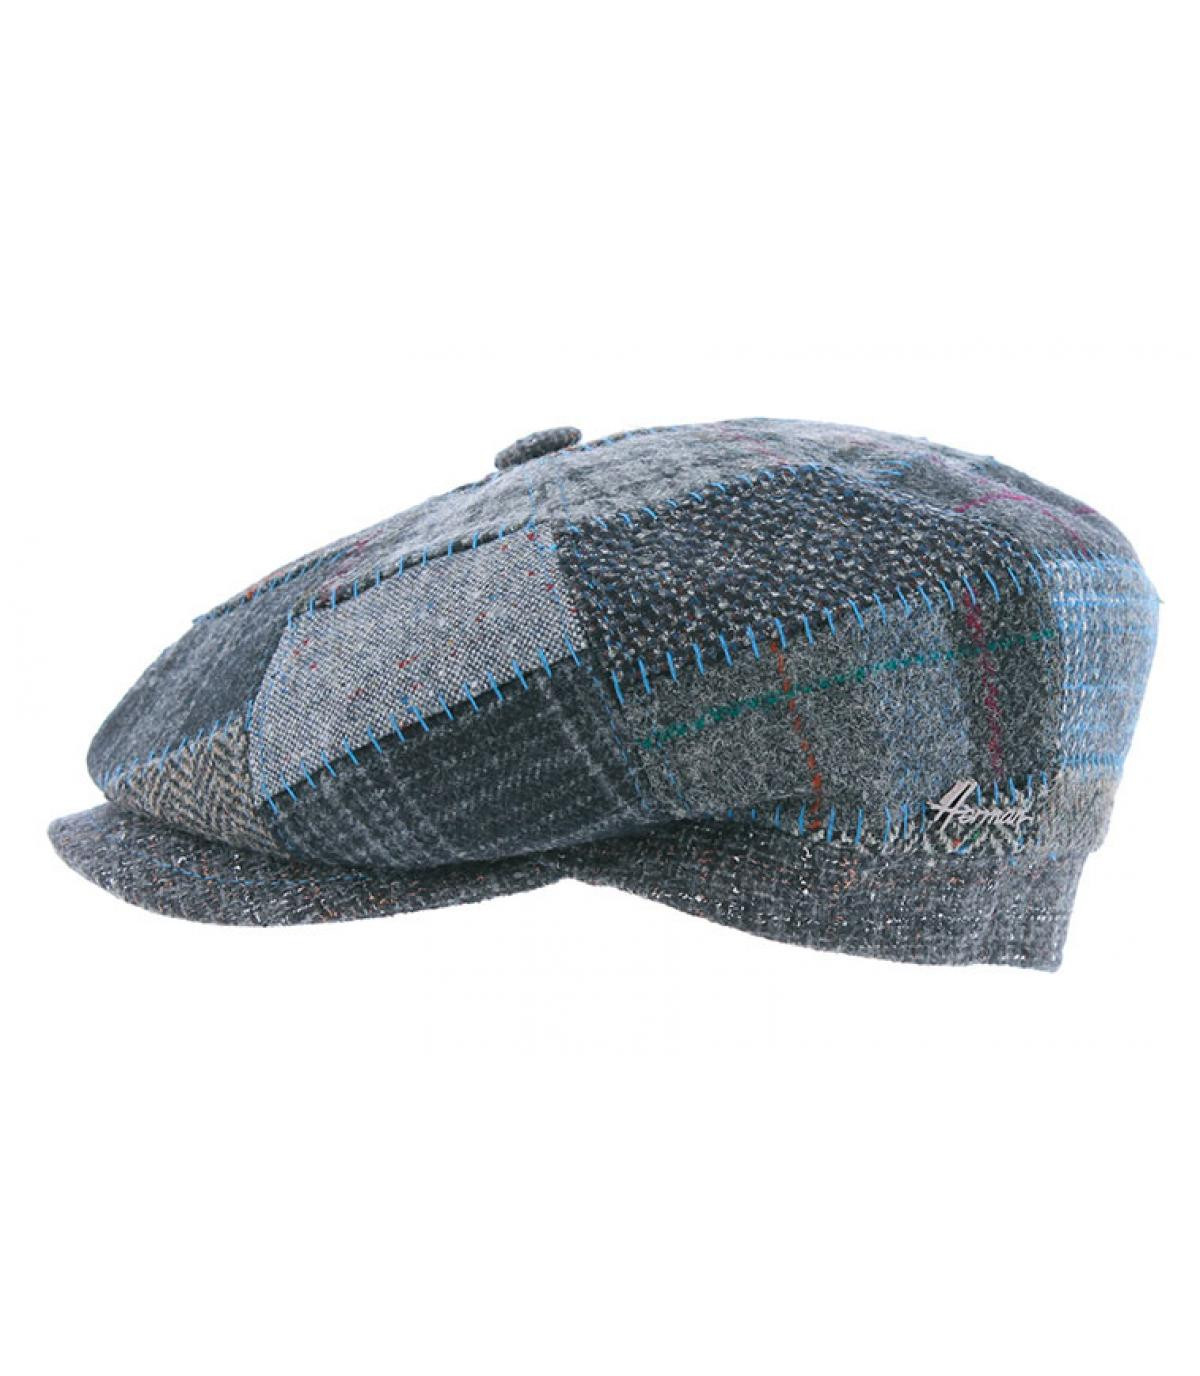 gorra repartidor azul patchwork